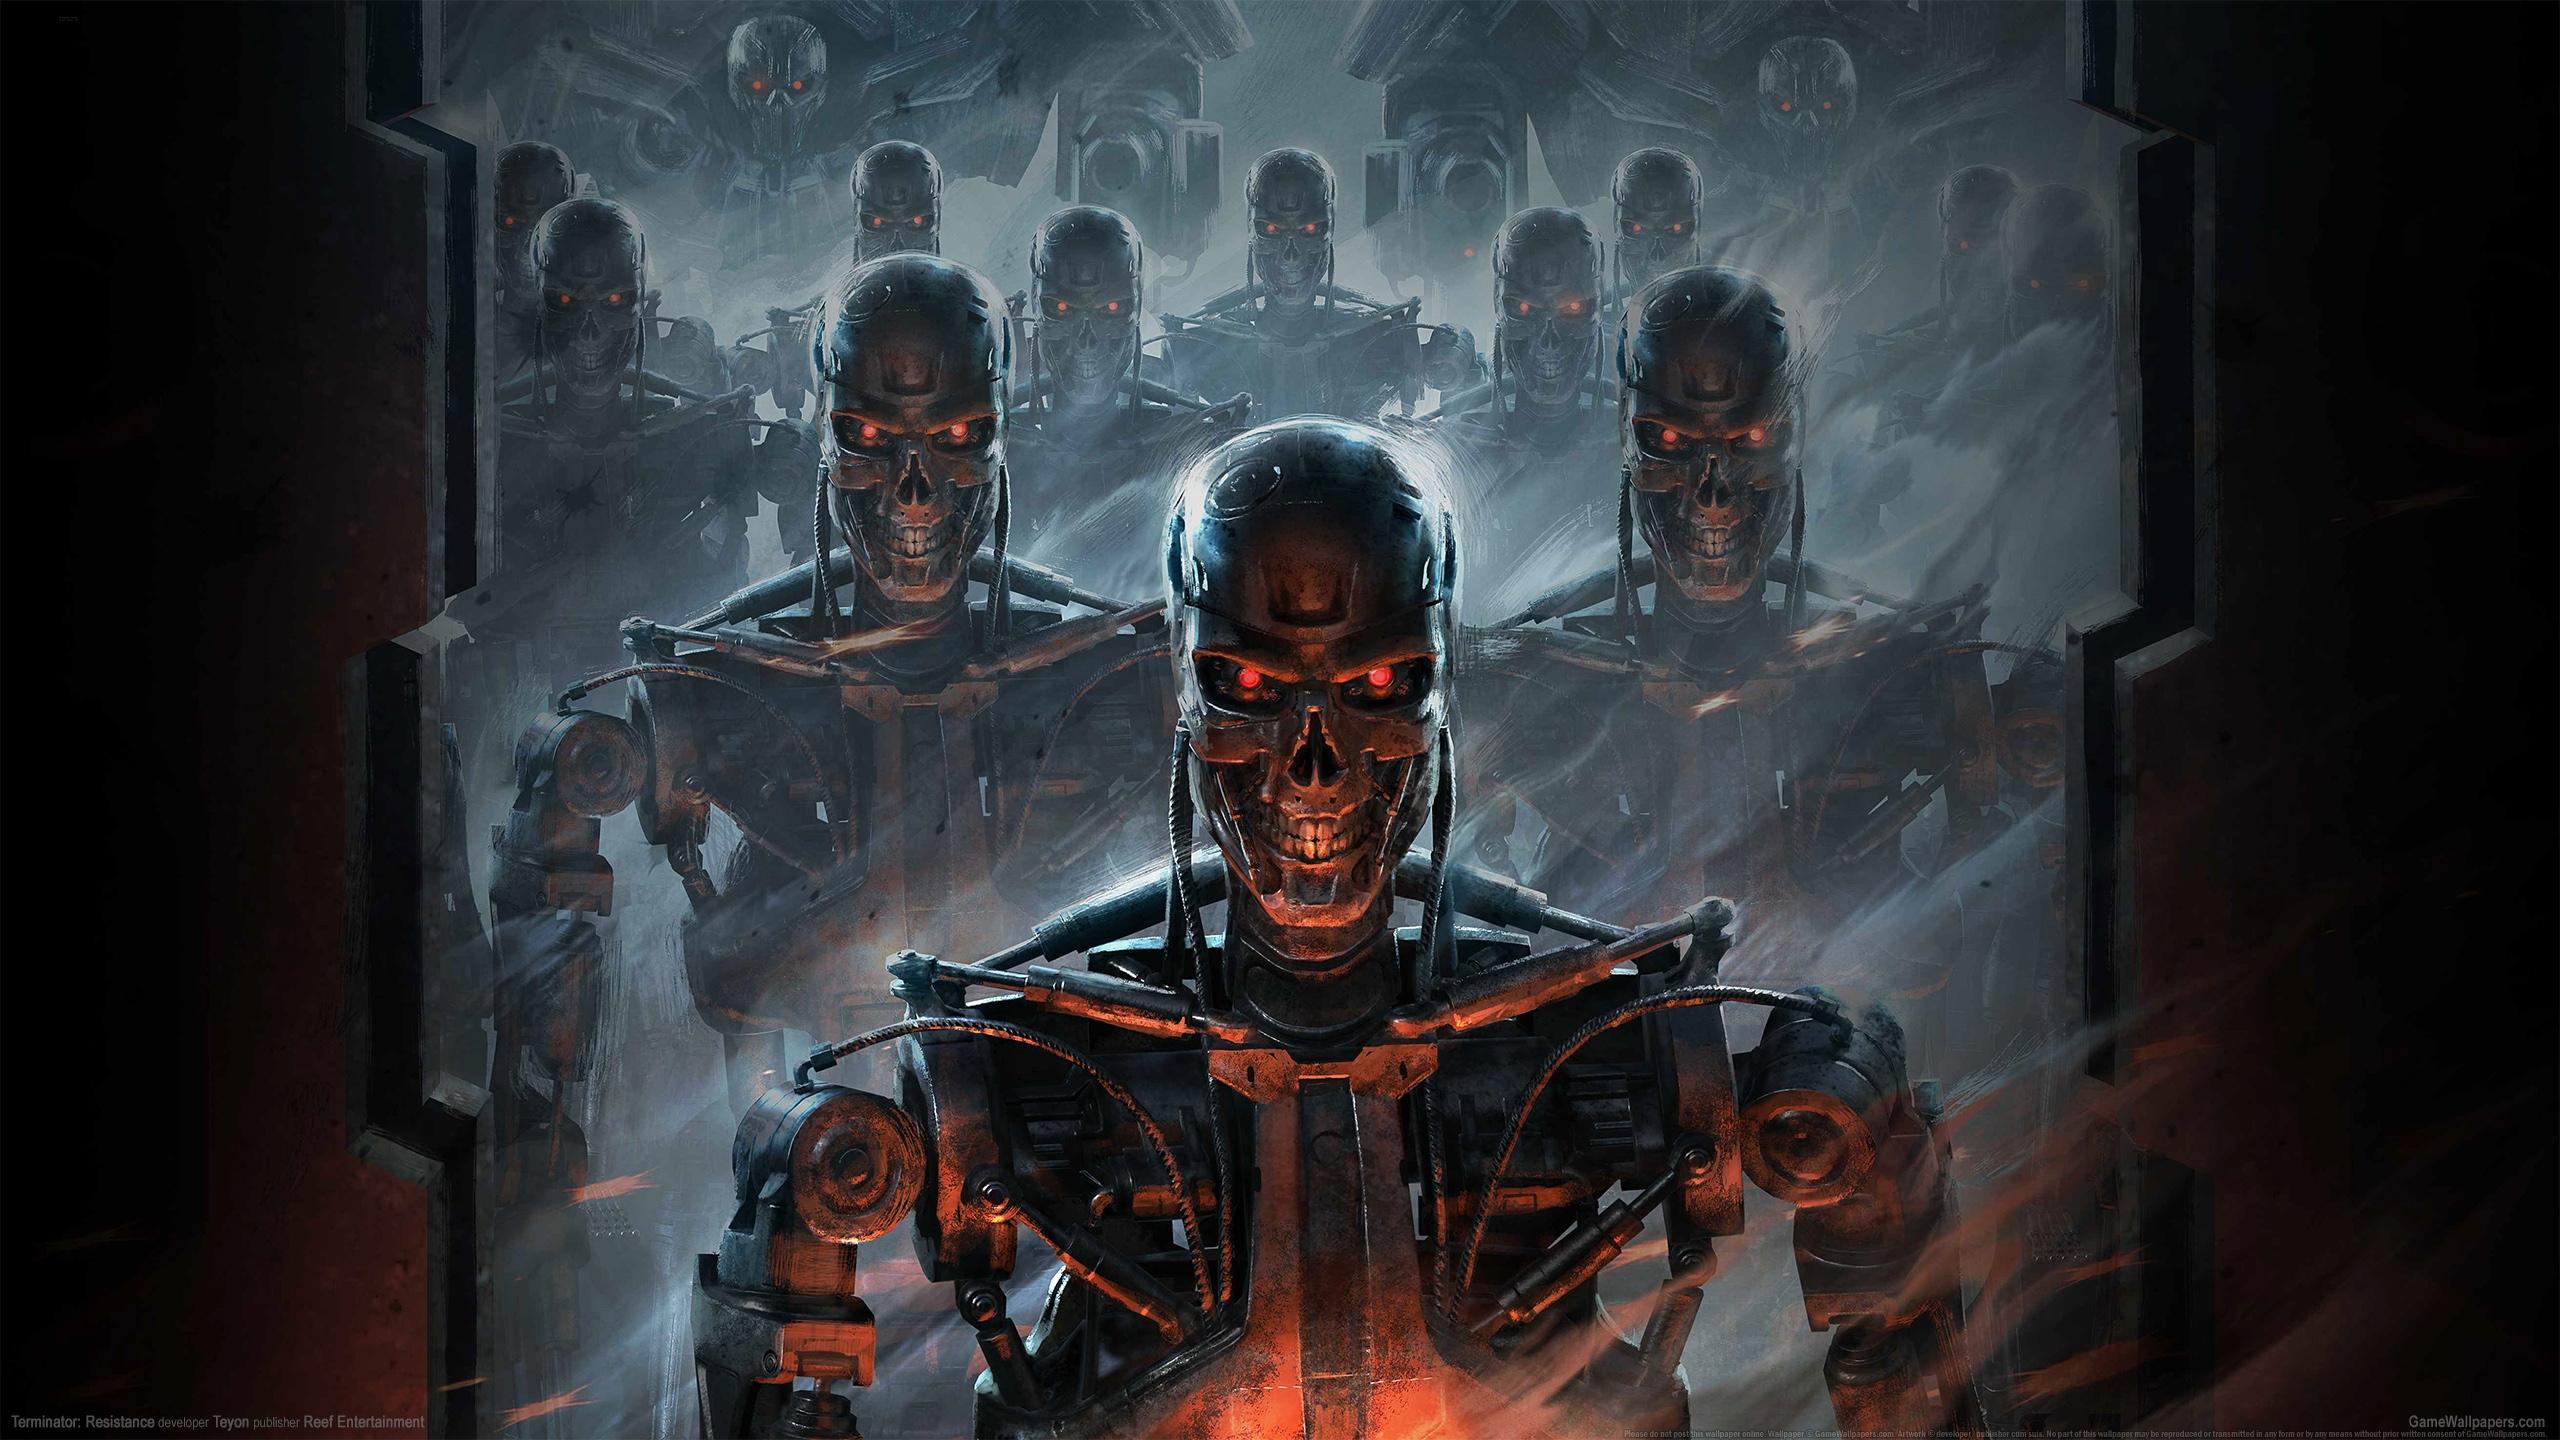 Terminator: Resistance 2560x1440 Hintergrundbild 01